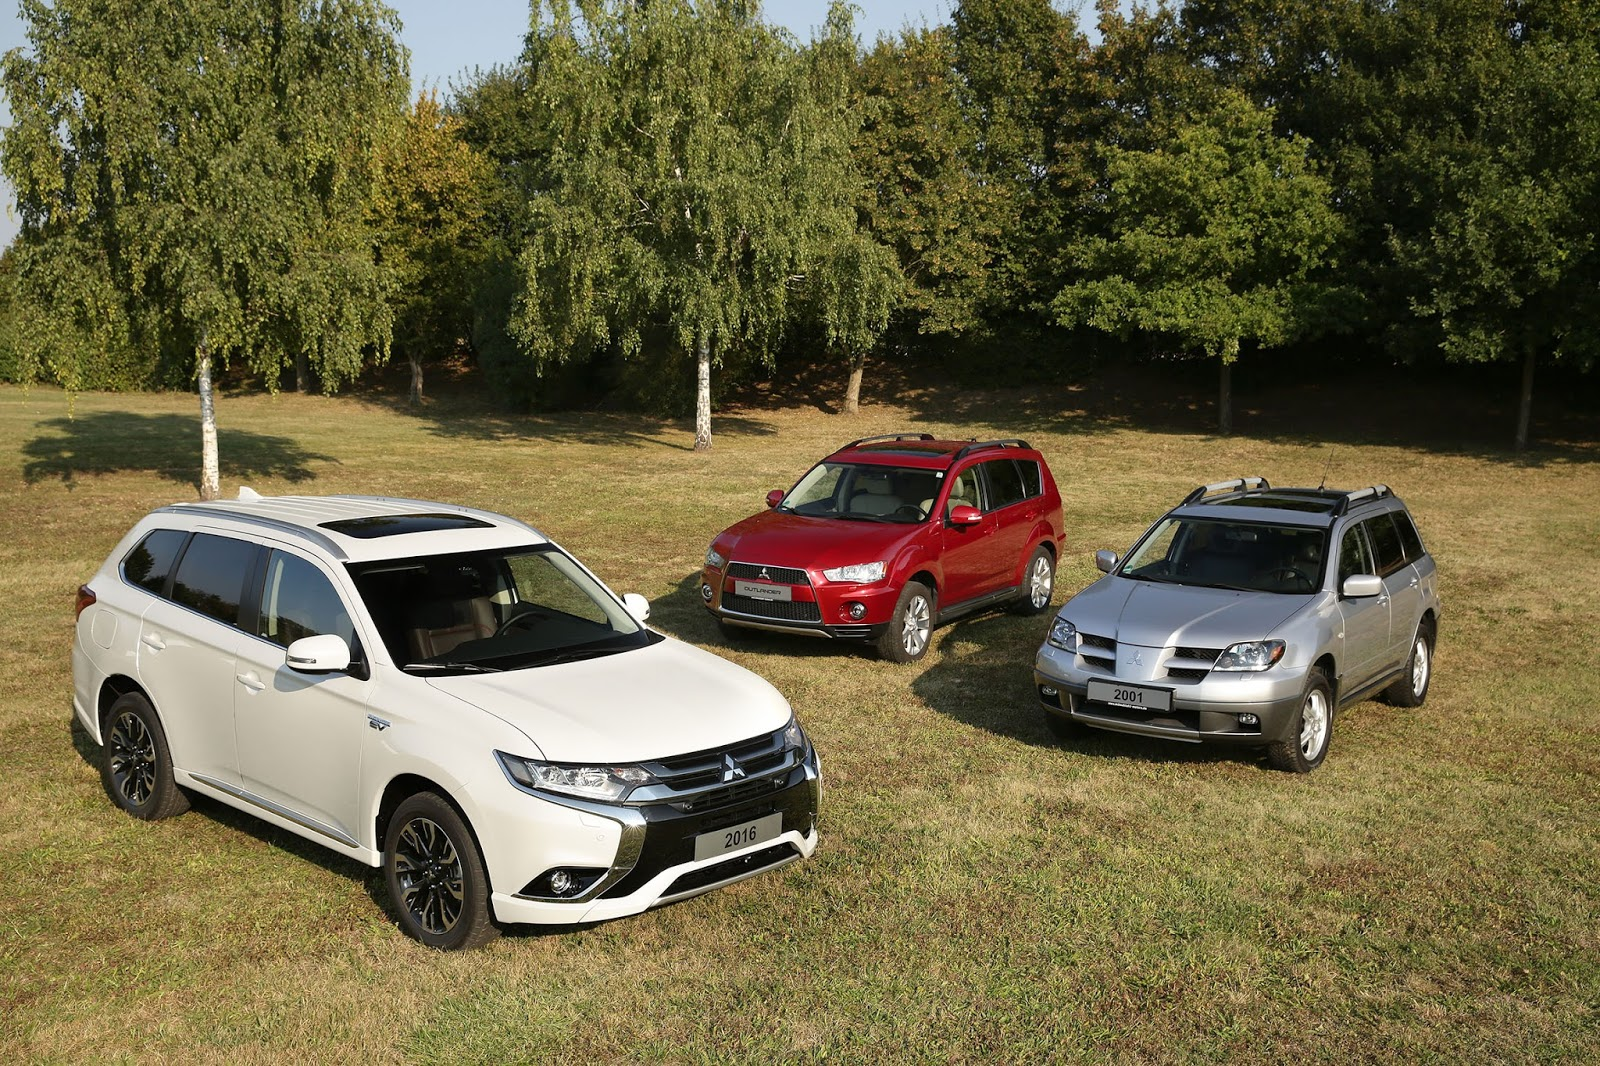 Outlander2Bfamily2B 2B15th2BI Το Mitsubishi Outlander έγινε 15 χρονών Mitsubishi, Mitsubishi Outlander, Mitsubishi Outlander PHEV, SUV